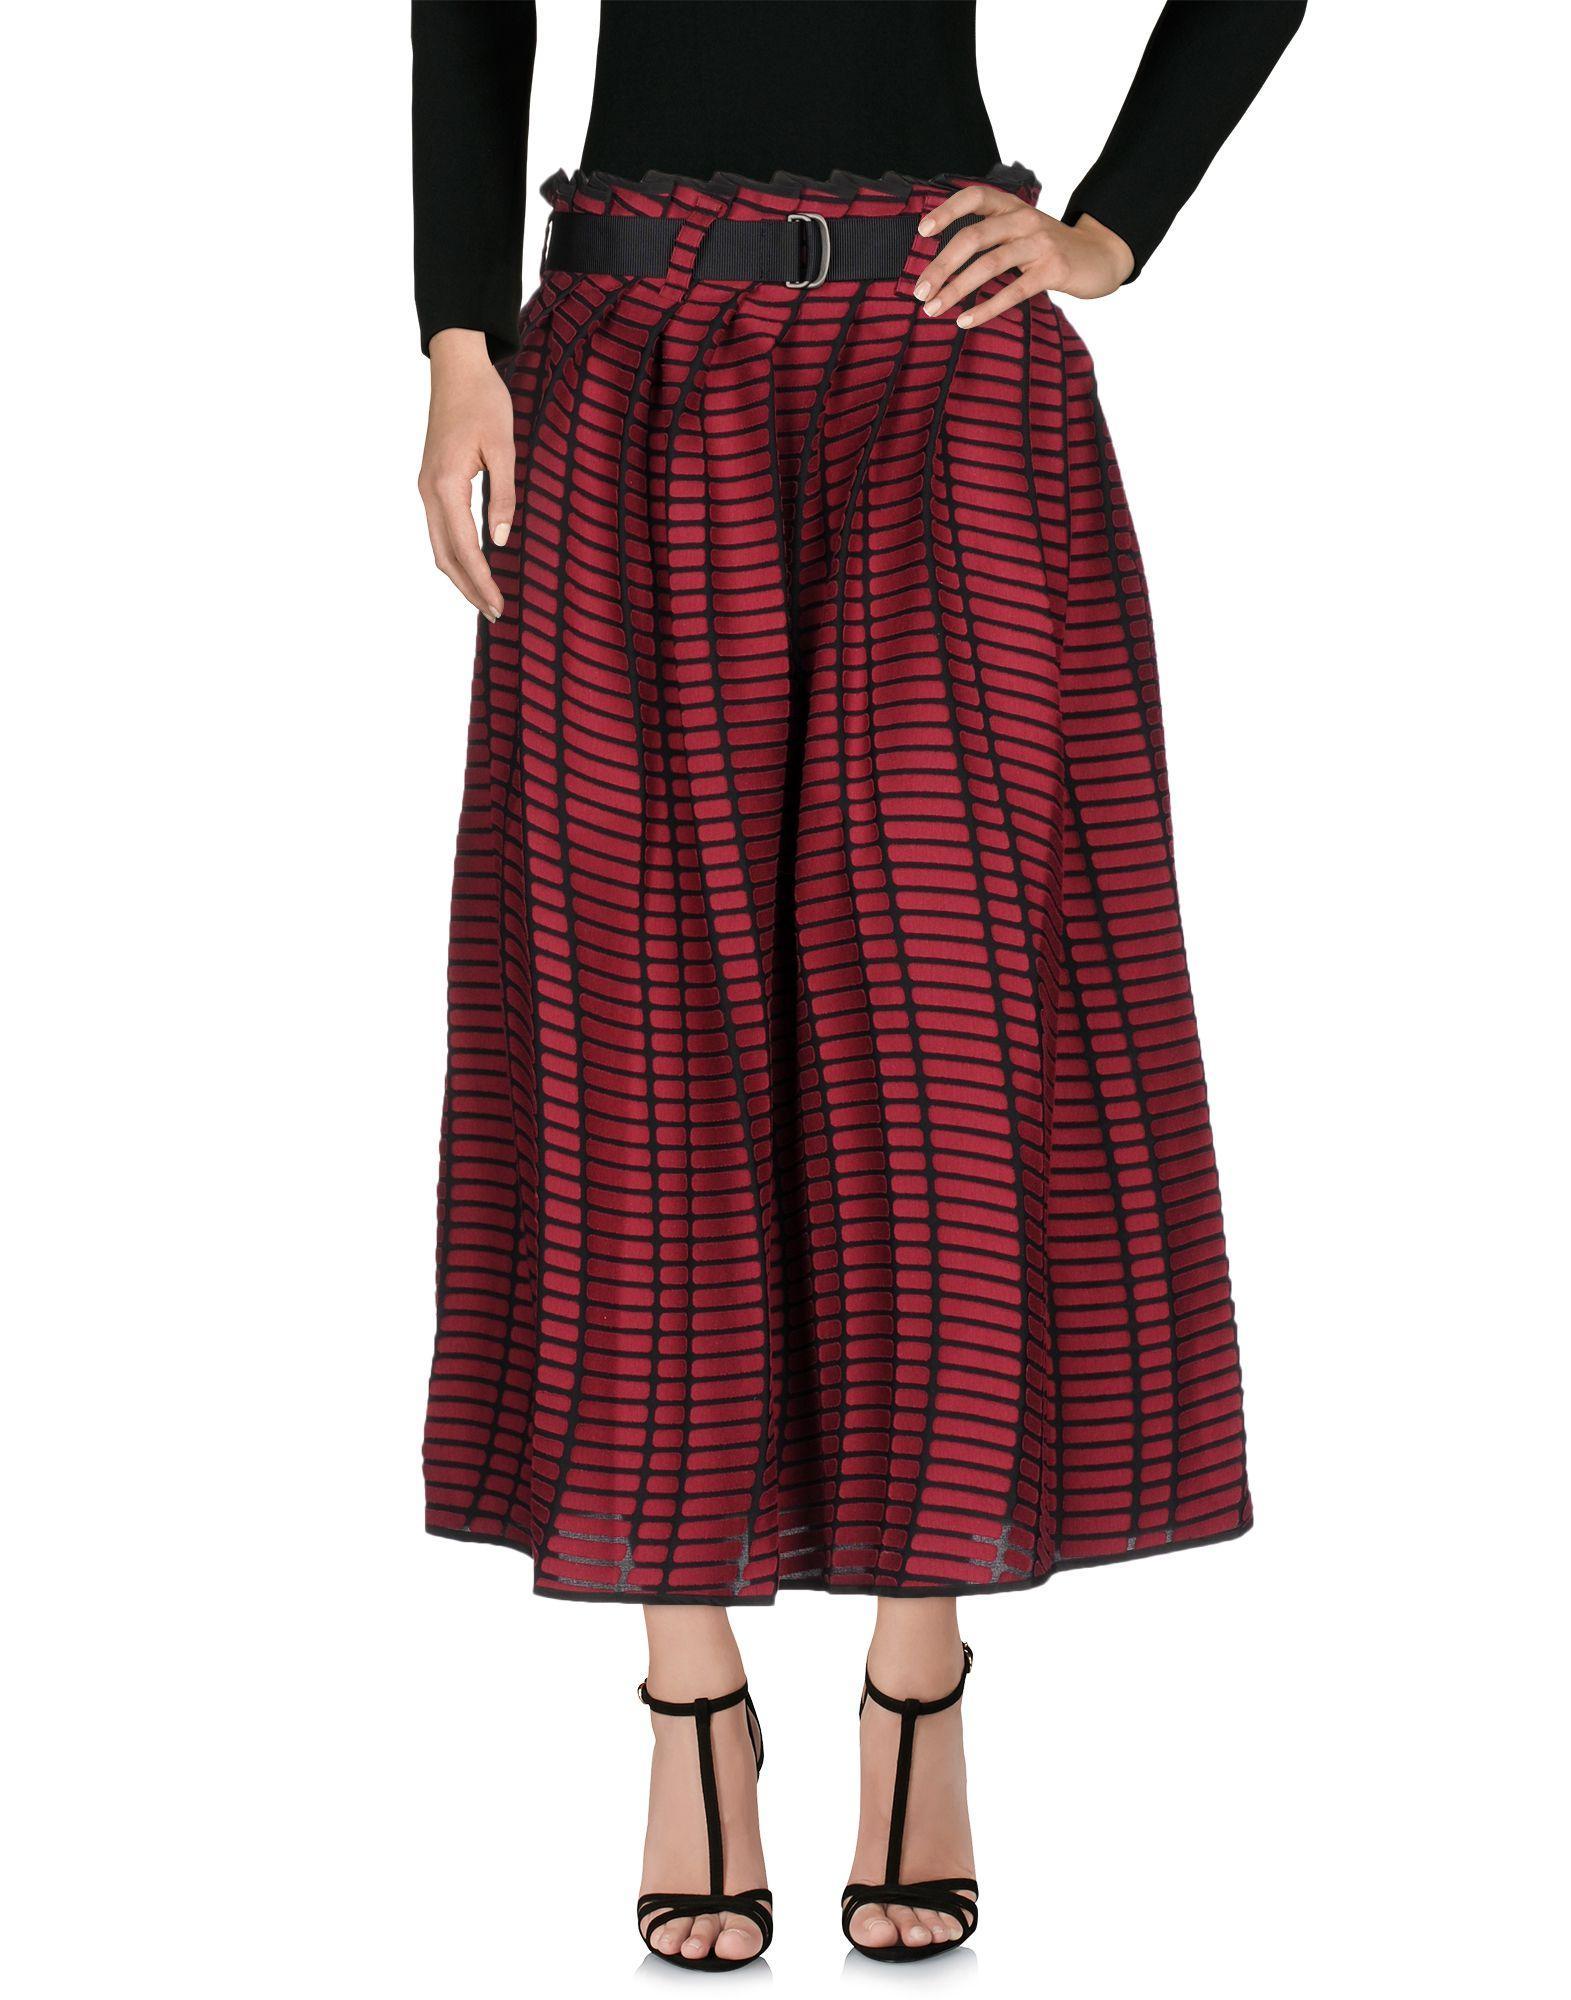 Issey Miyake Maxi Skirts In Maroon